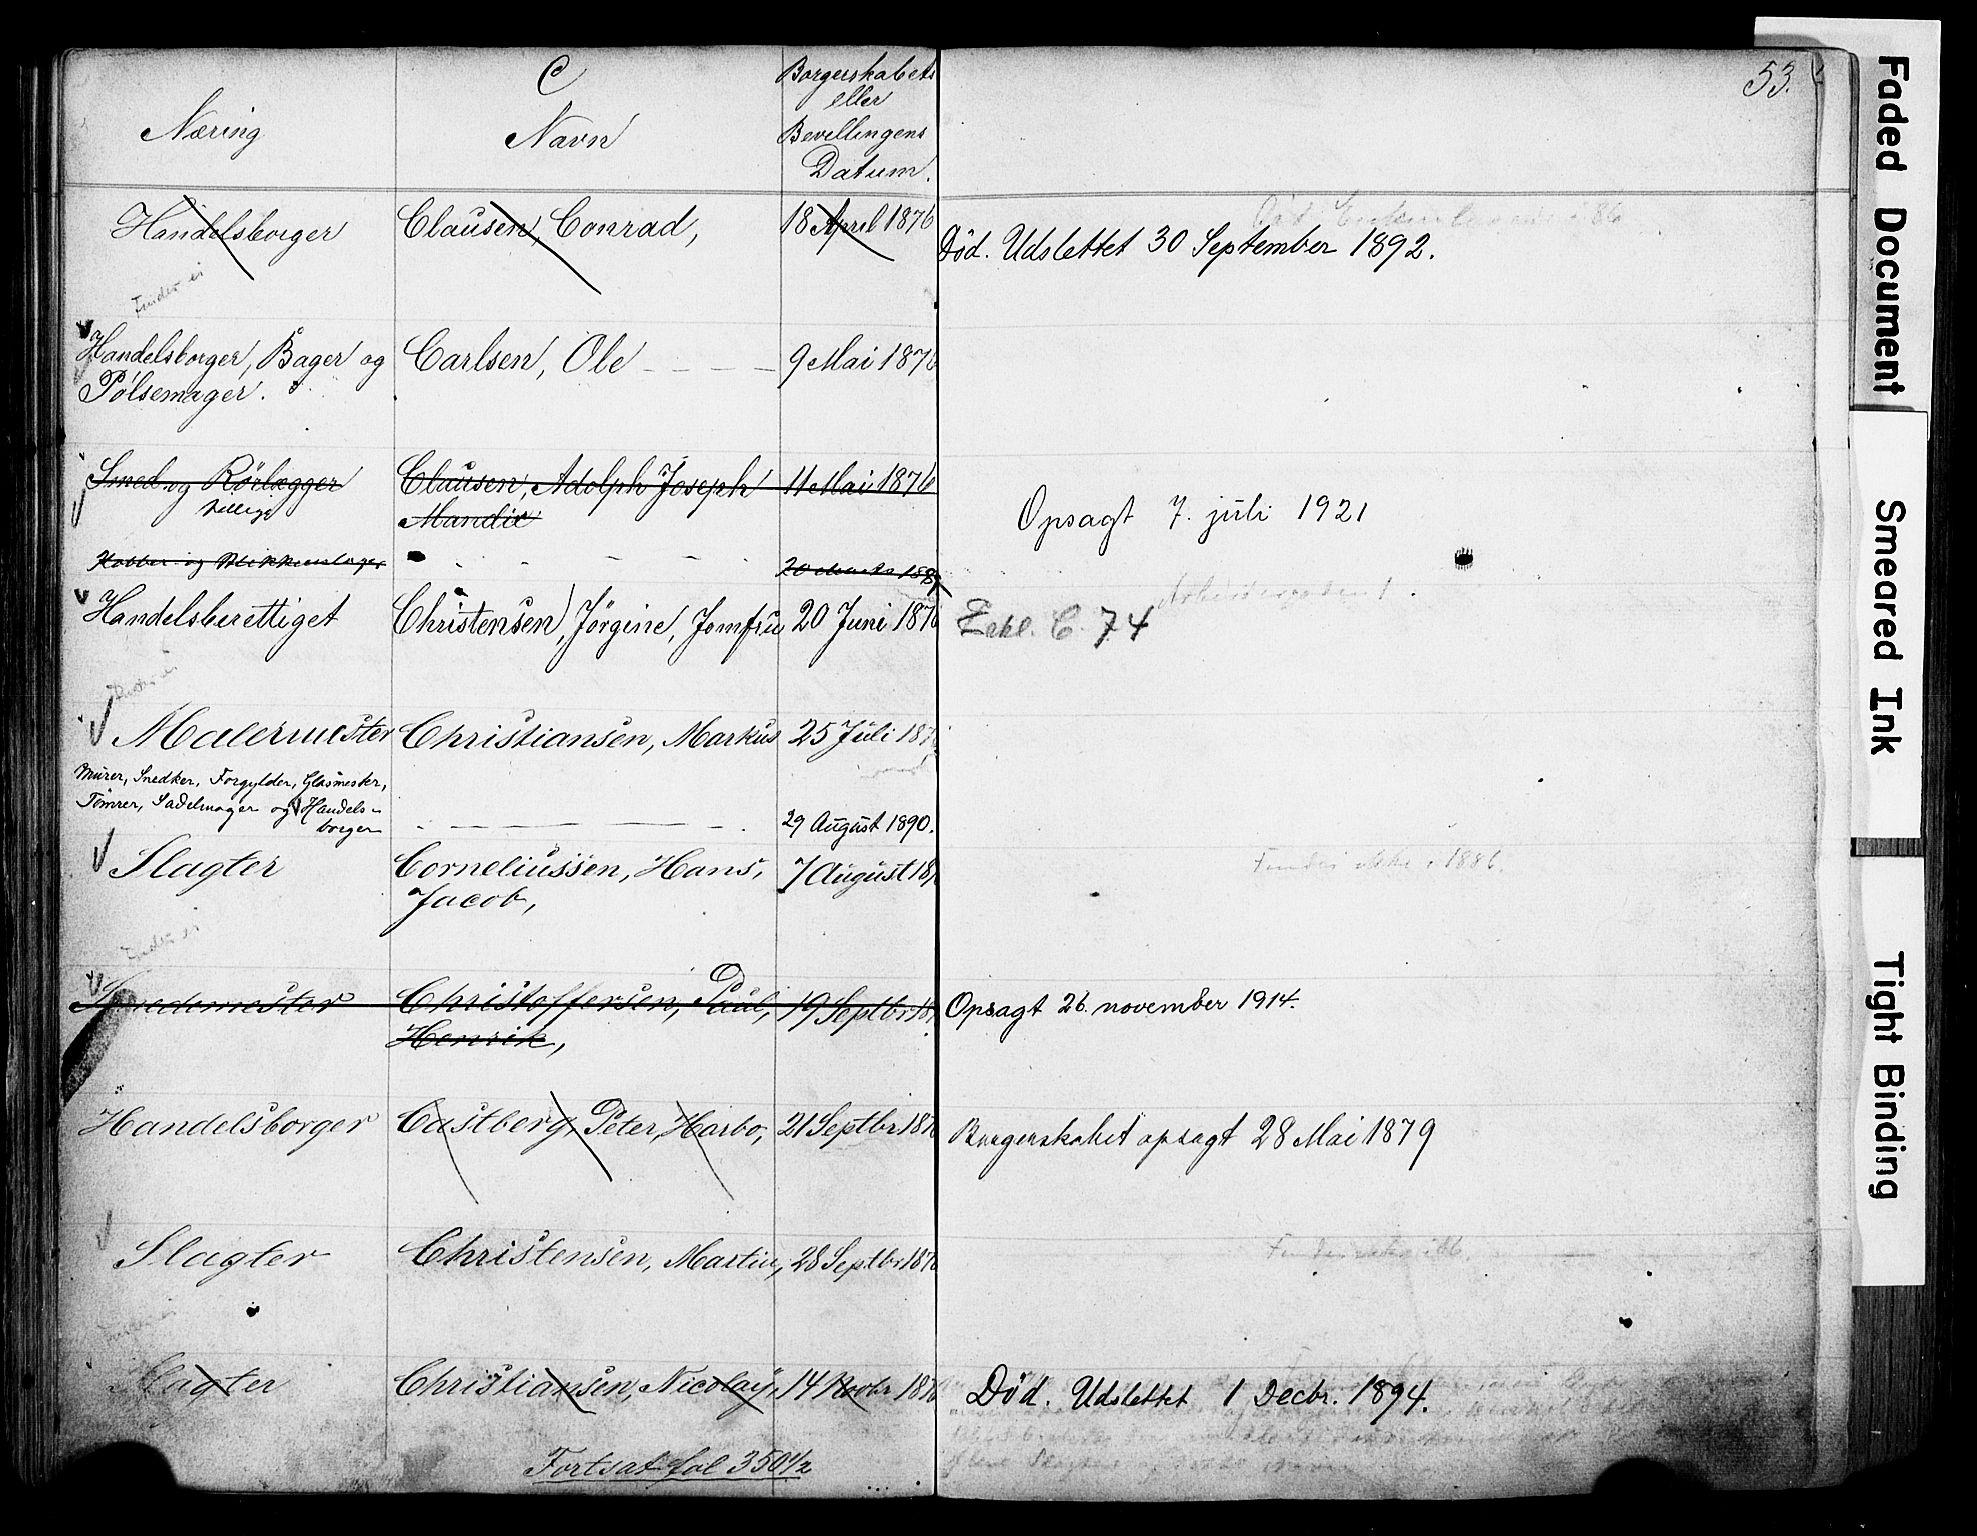 SAO, Kristiania magistrat, F/Fb/L0004: Borgerrulle, 1860-1879, s. 55